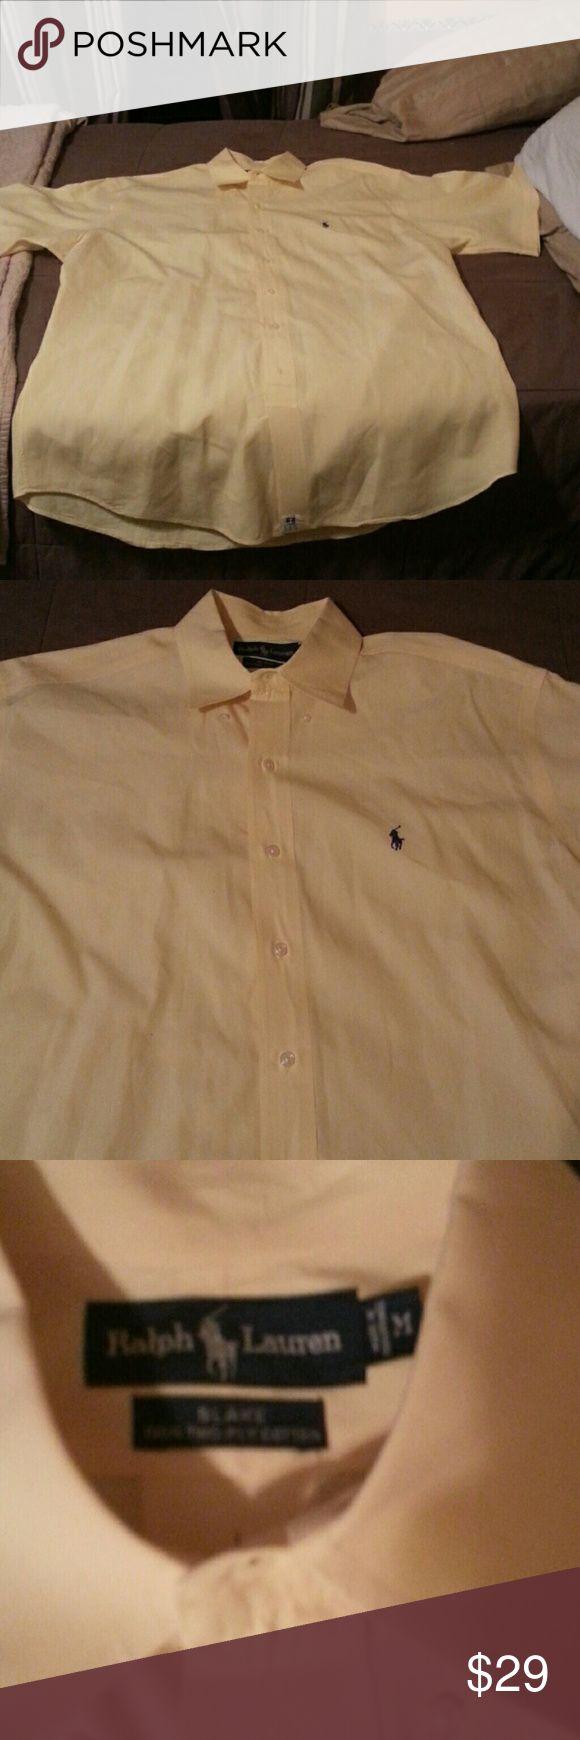 Short Sleeve Ralph Lauren Dress Shirt Fits close to a large. This shirt has only been worn 6-7 times. Polo by Ralph Lauren Shirts Dress Shirts